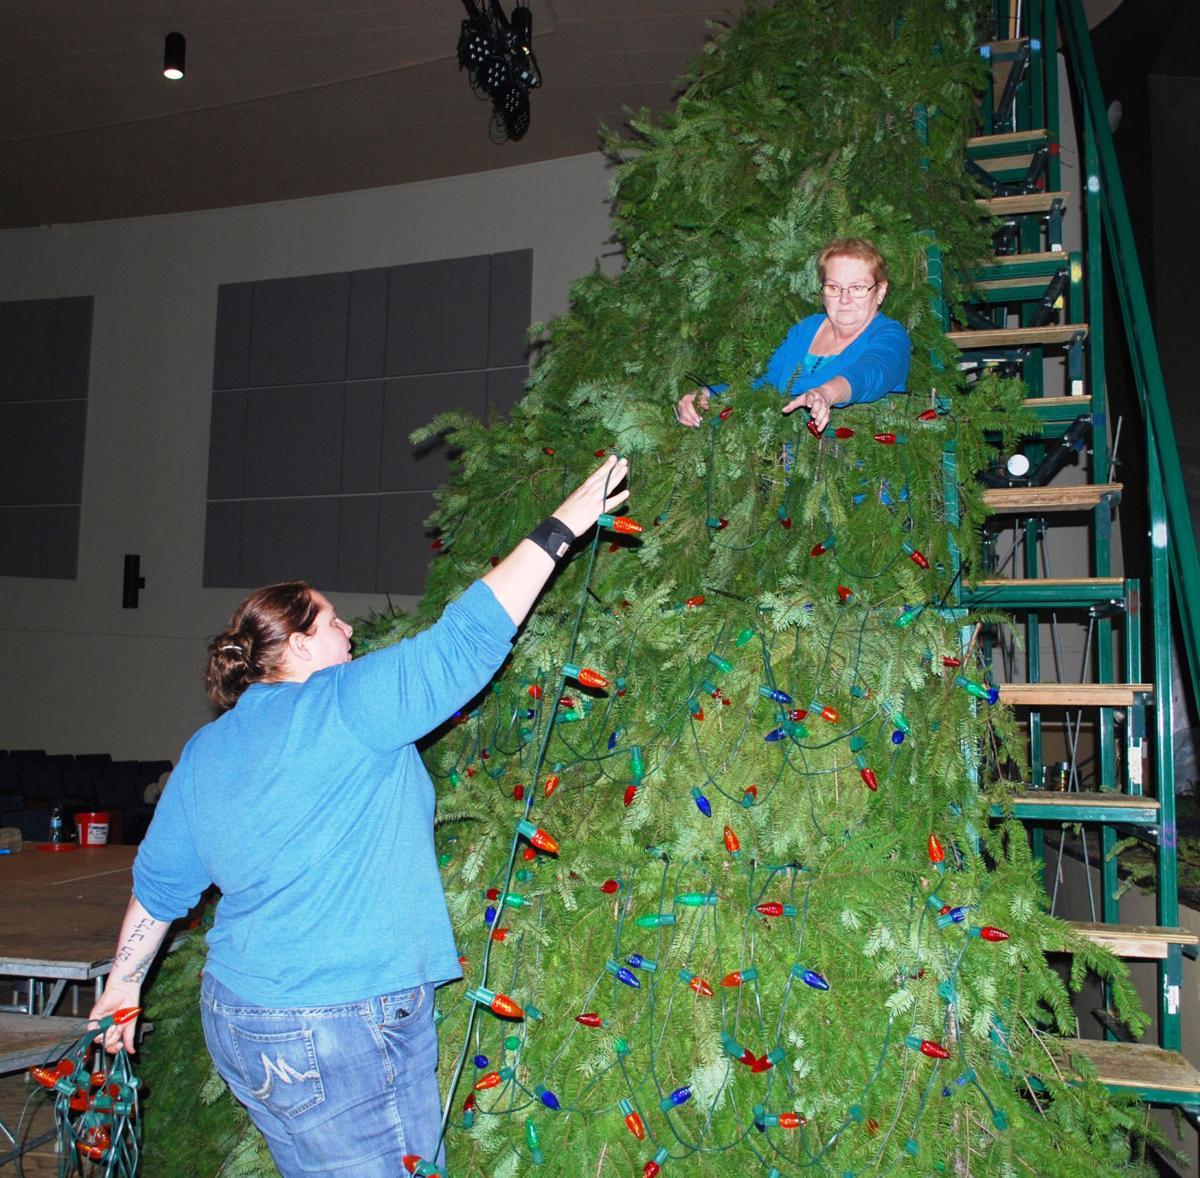 112917 adh nws singing tree 1jpg - Singing Christmas Tree Lights